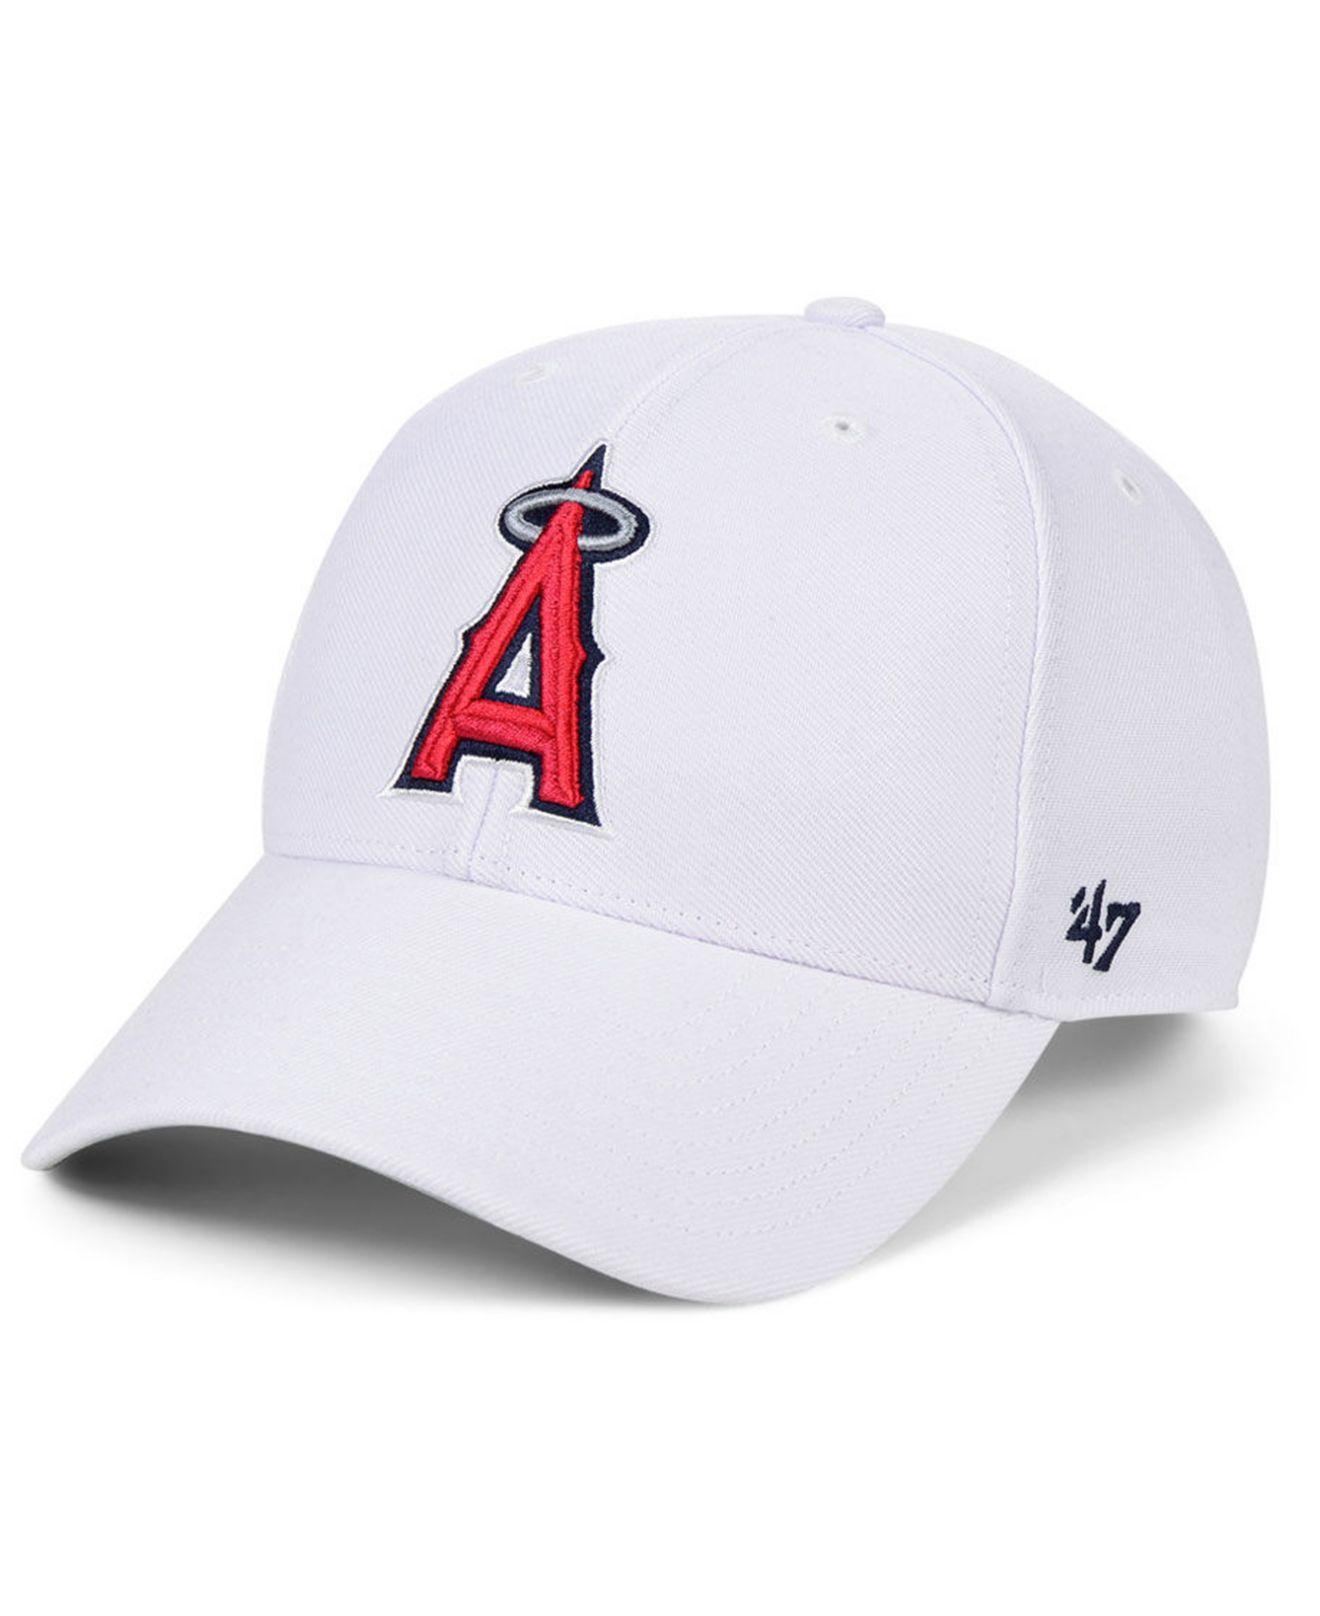 quality design 073c9 d2eea 47 Brand. Women s Los Angeles Angels White Mvp Cap